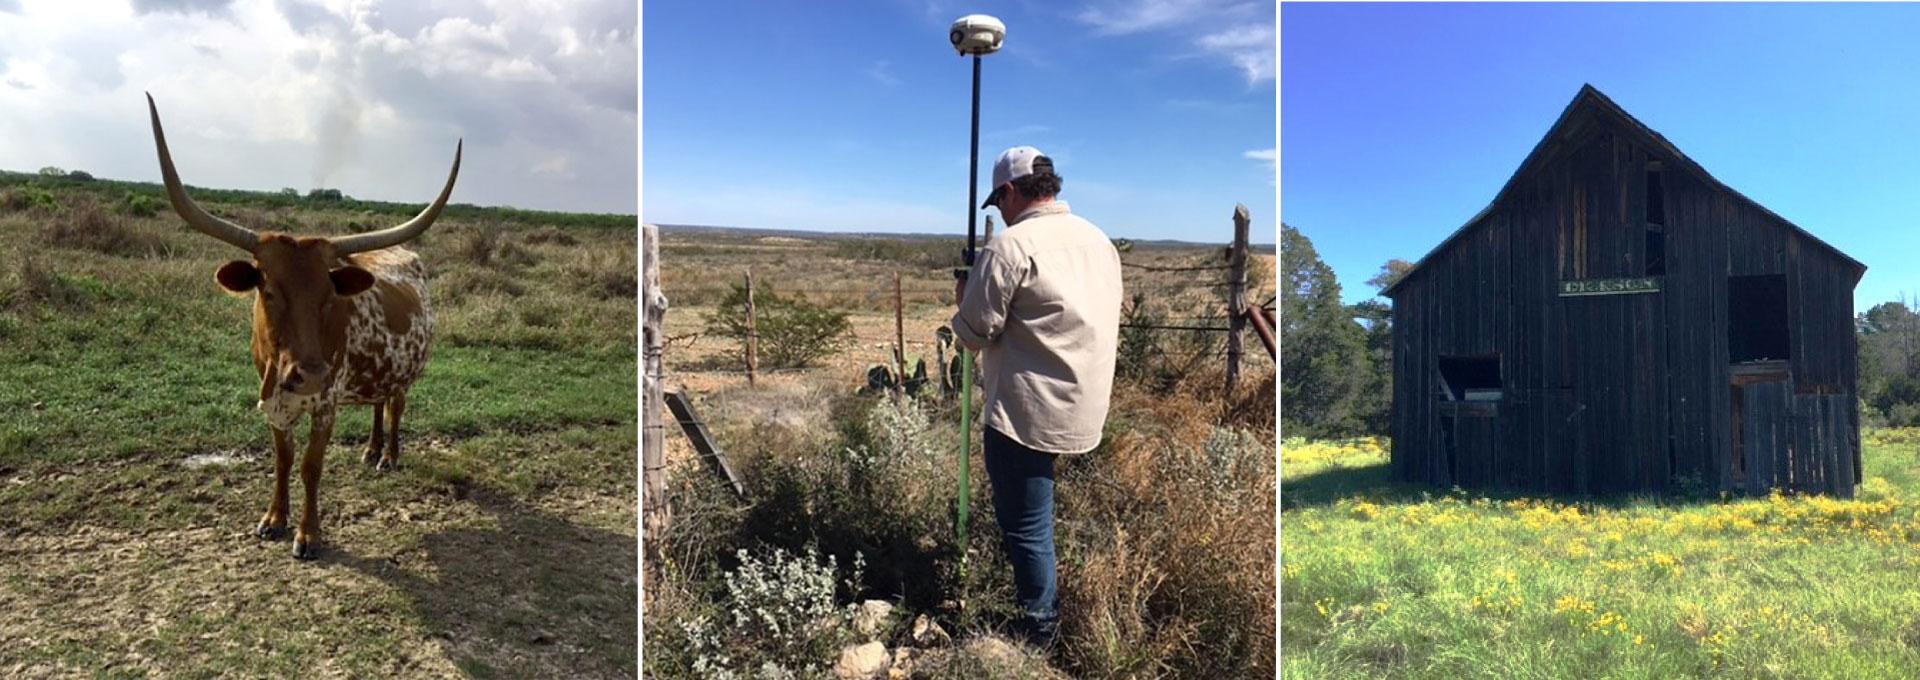 Texas longhorn, TX licensed land surveyor, Texas farm survey